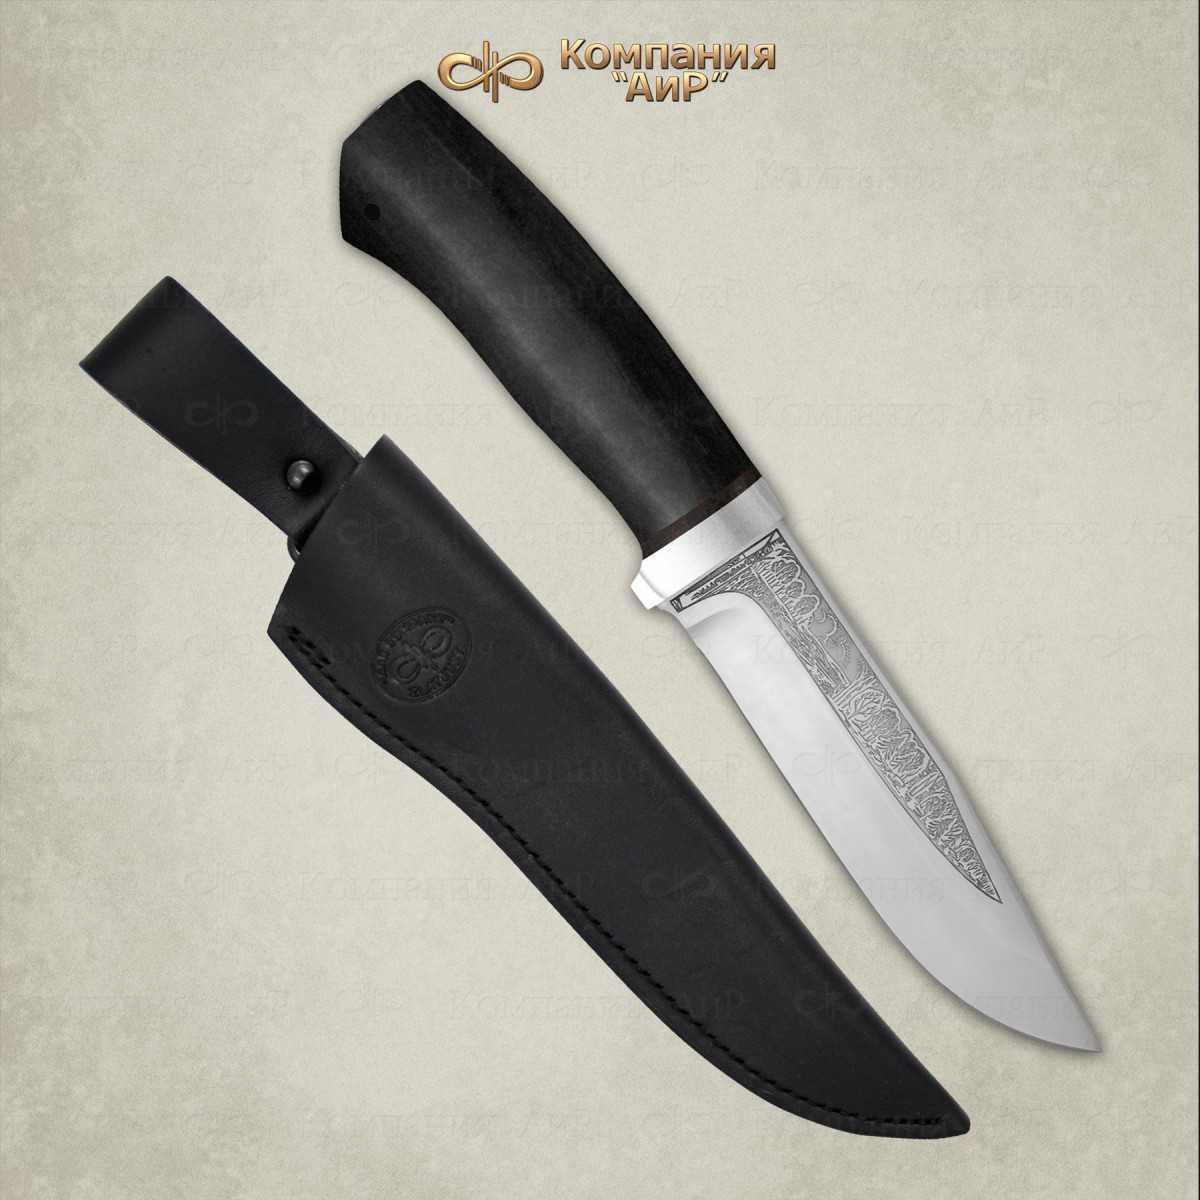 Нож АиР Турист, сталь ЭП-766, рукоять граб недорого